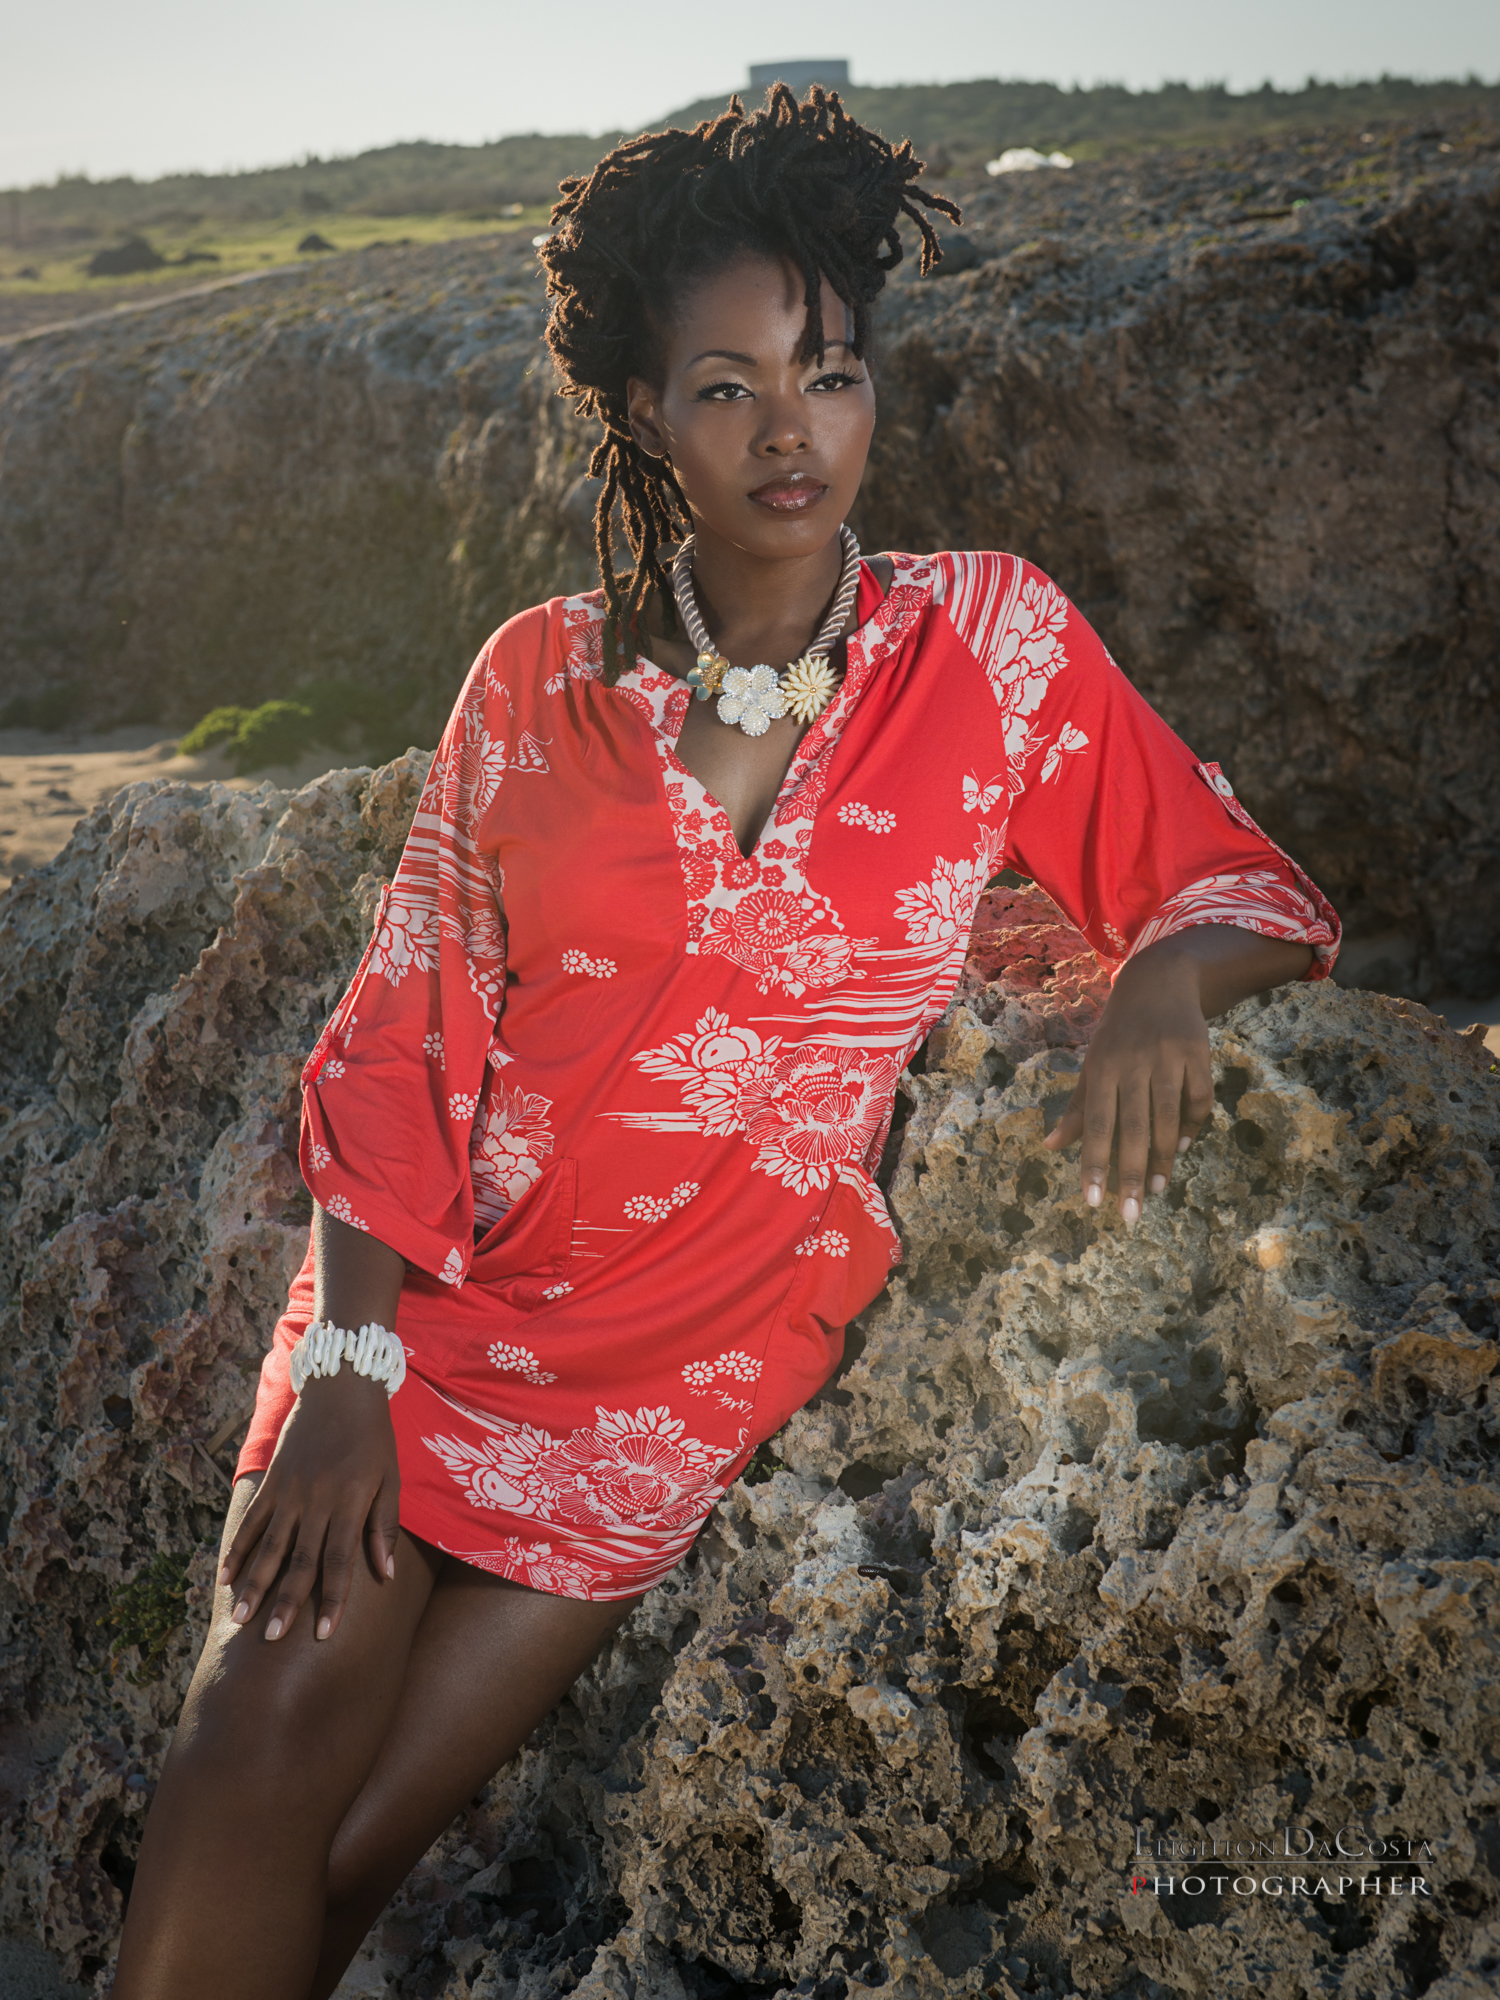 Tiffany-Leighton DaCosta-Photographer-Aruba-Tiffany DaCosta-0423-Retouched.jpg